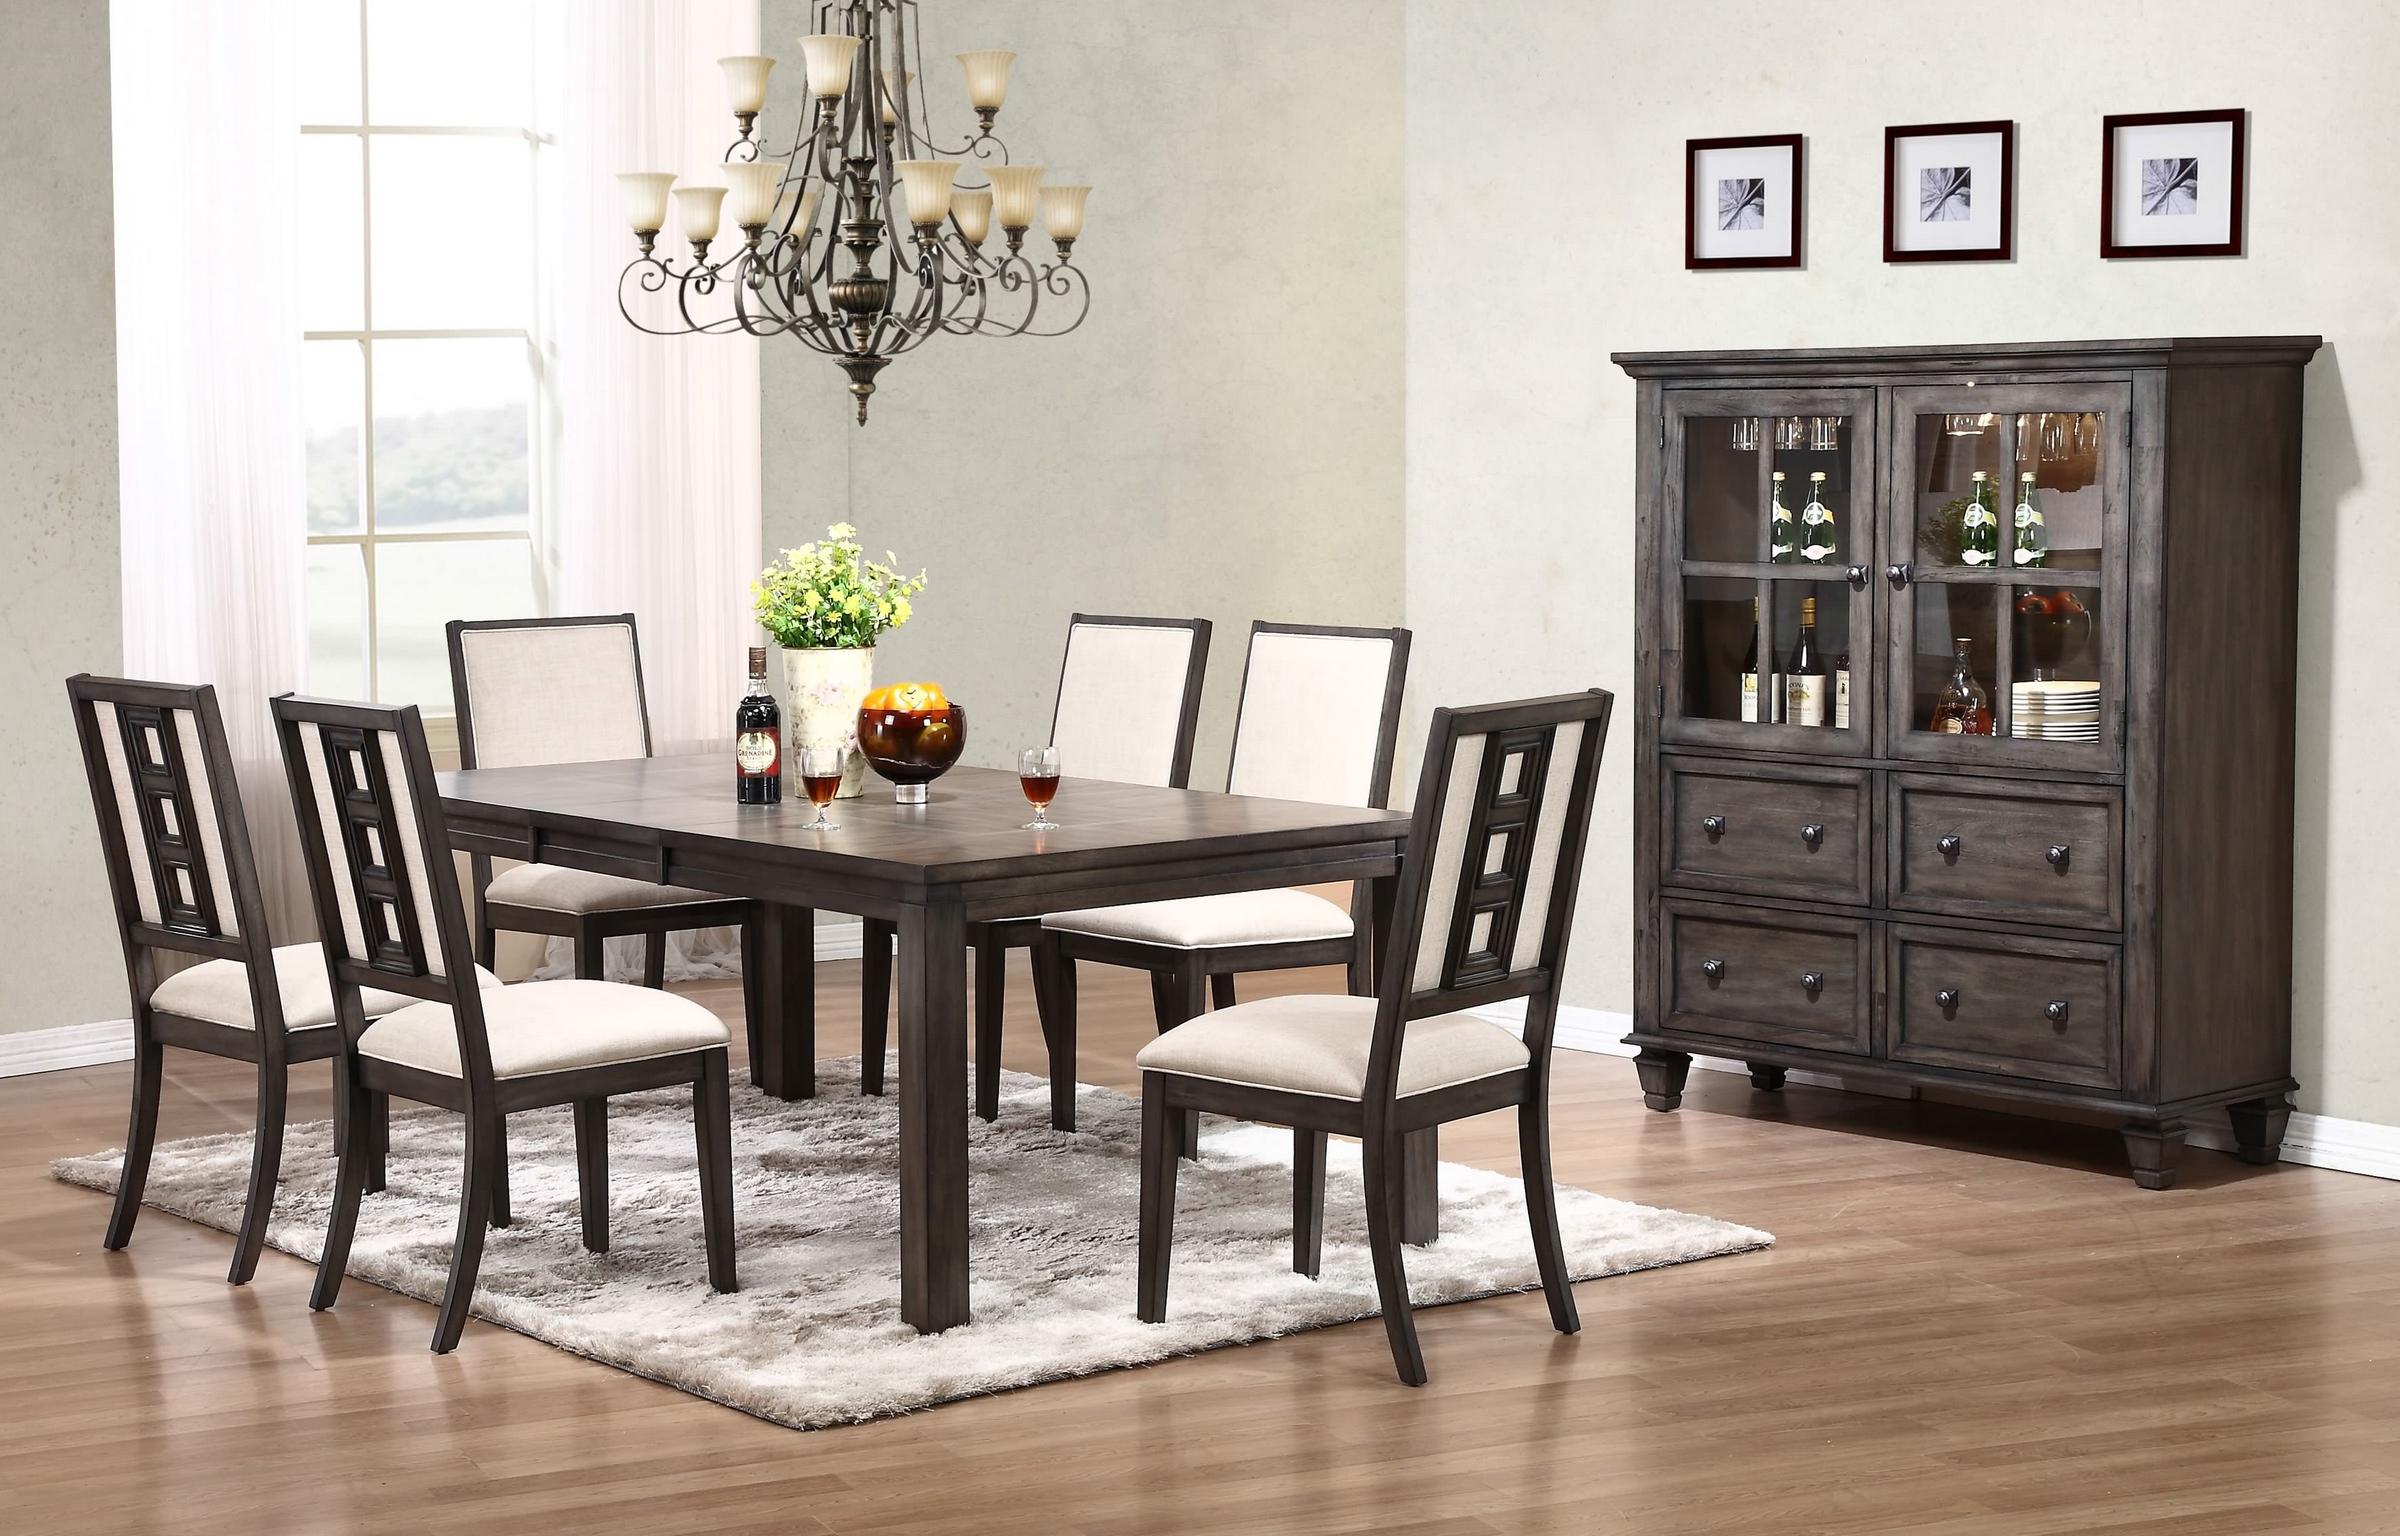 office chair kelowna troutman company 21 fantastic home furniture regina yvotube